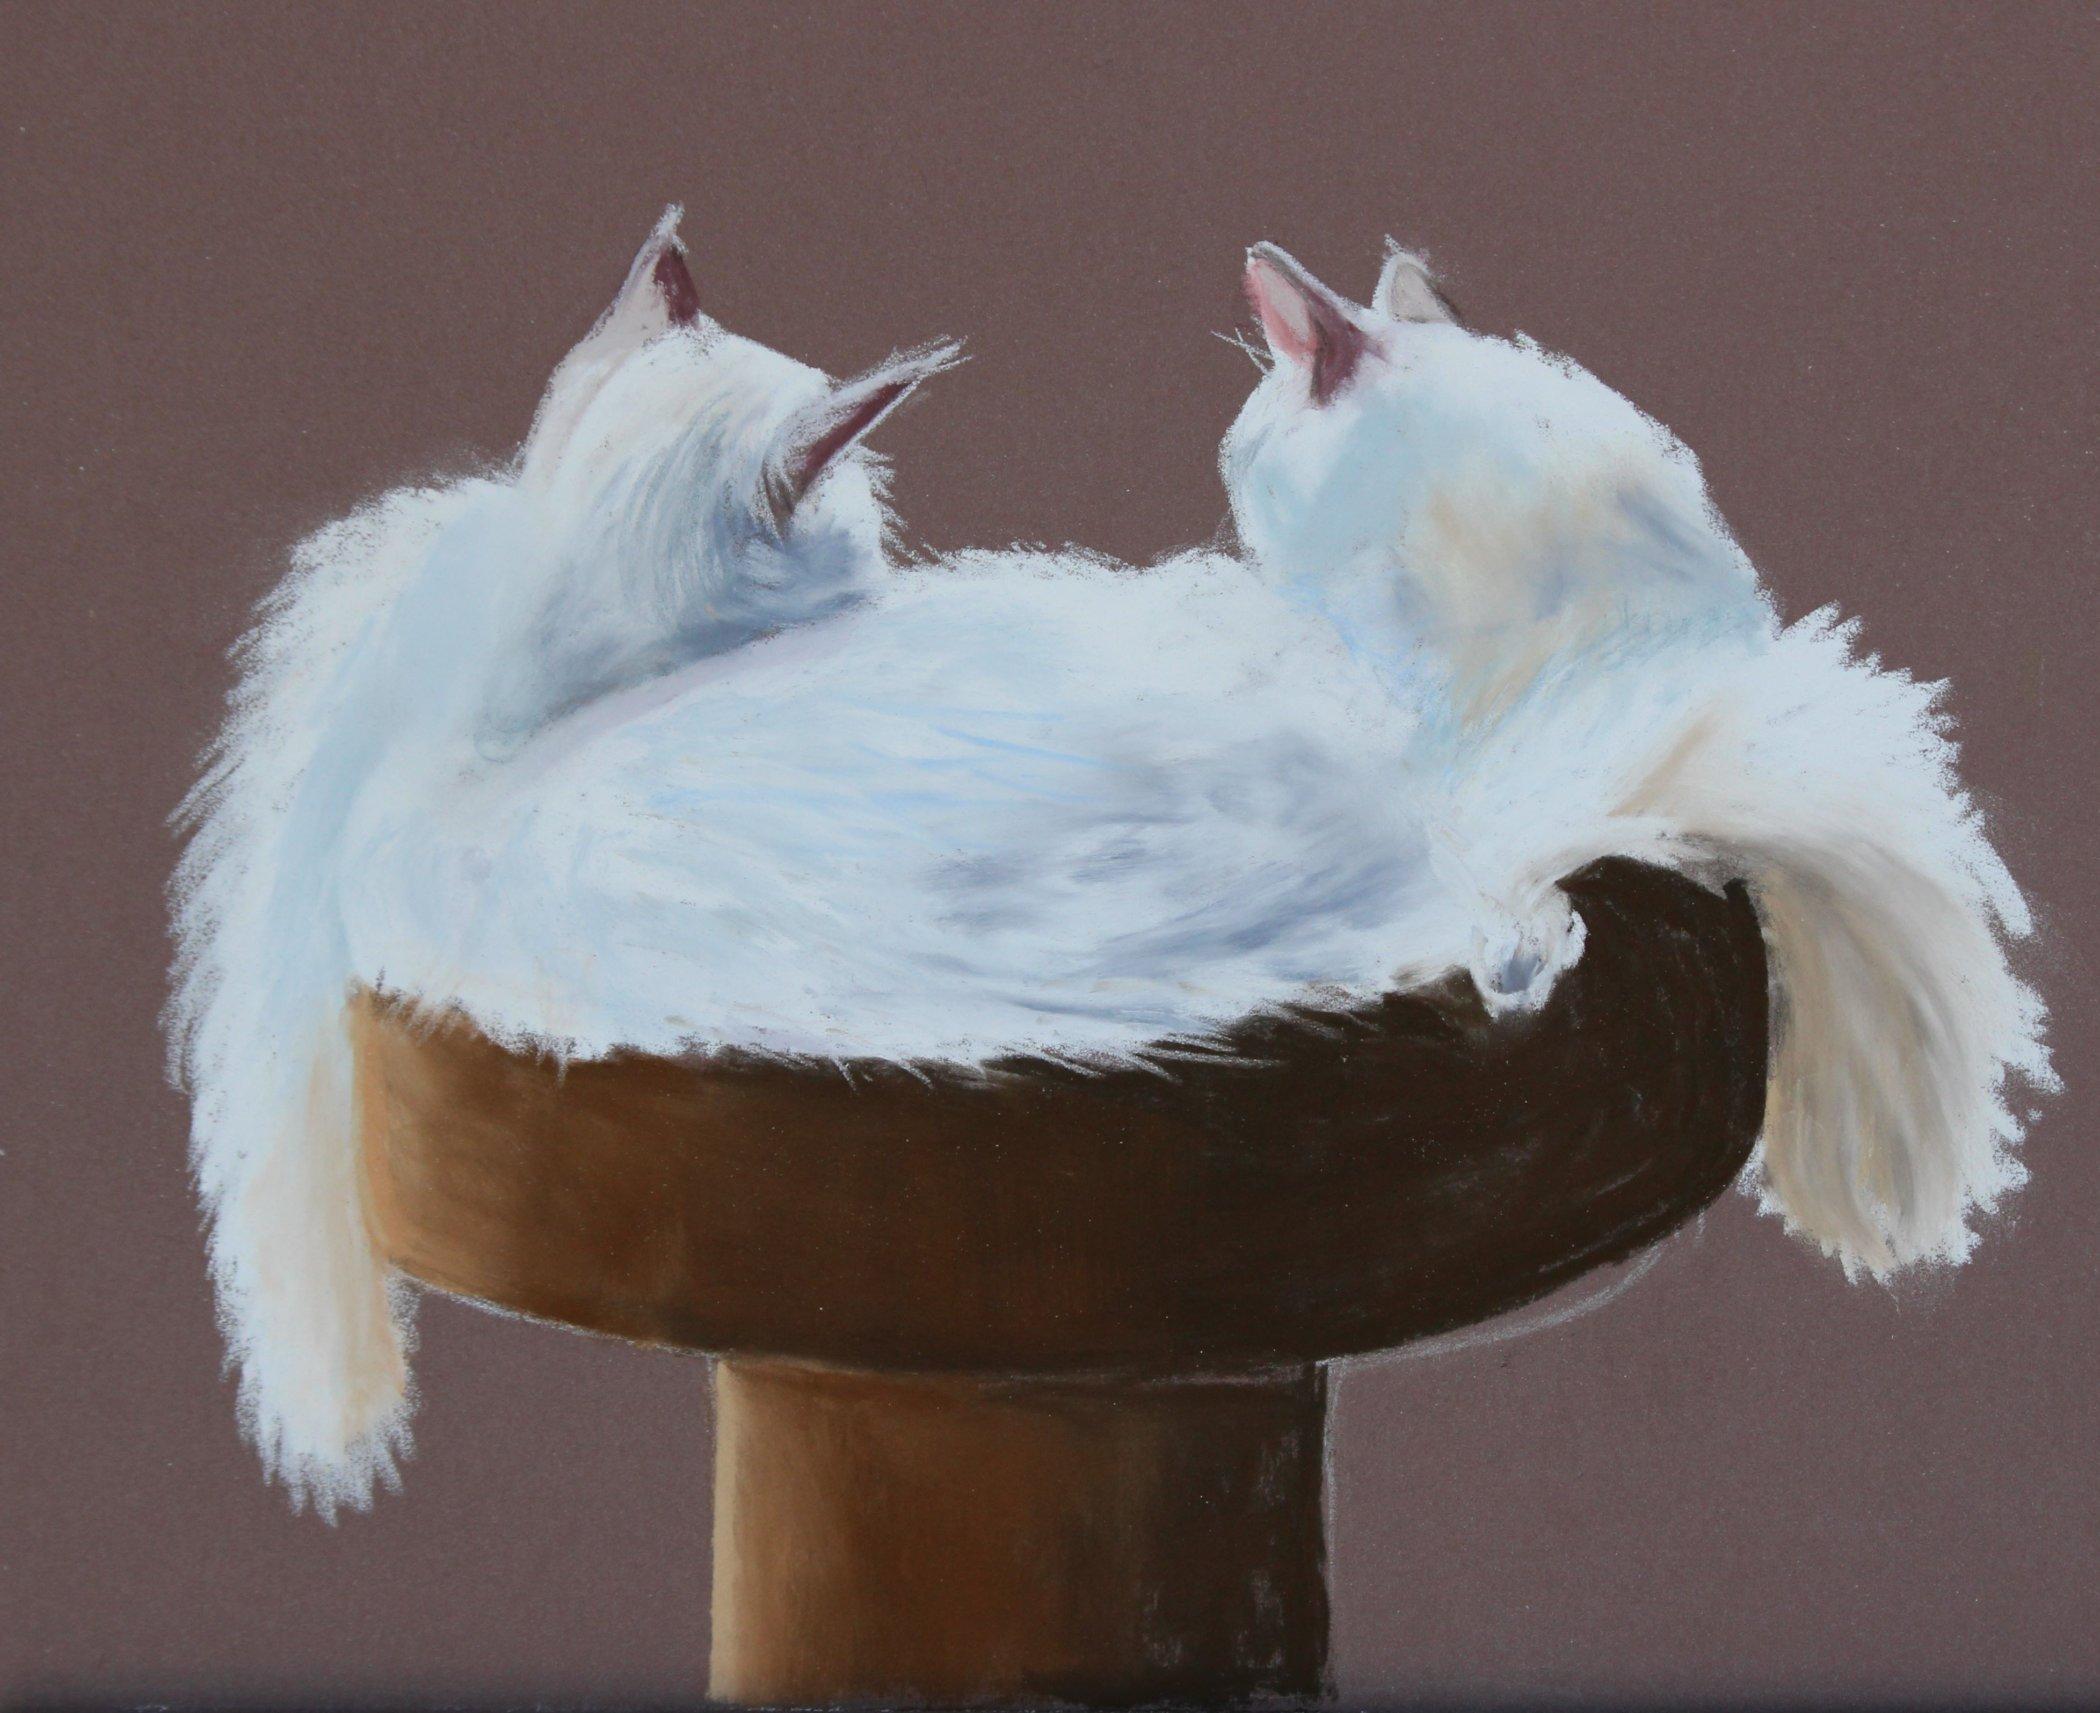 Friday Art Cat: Two Ragdolls